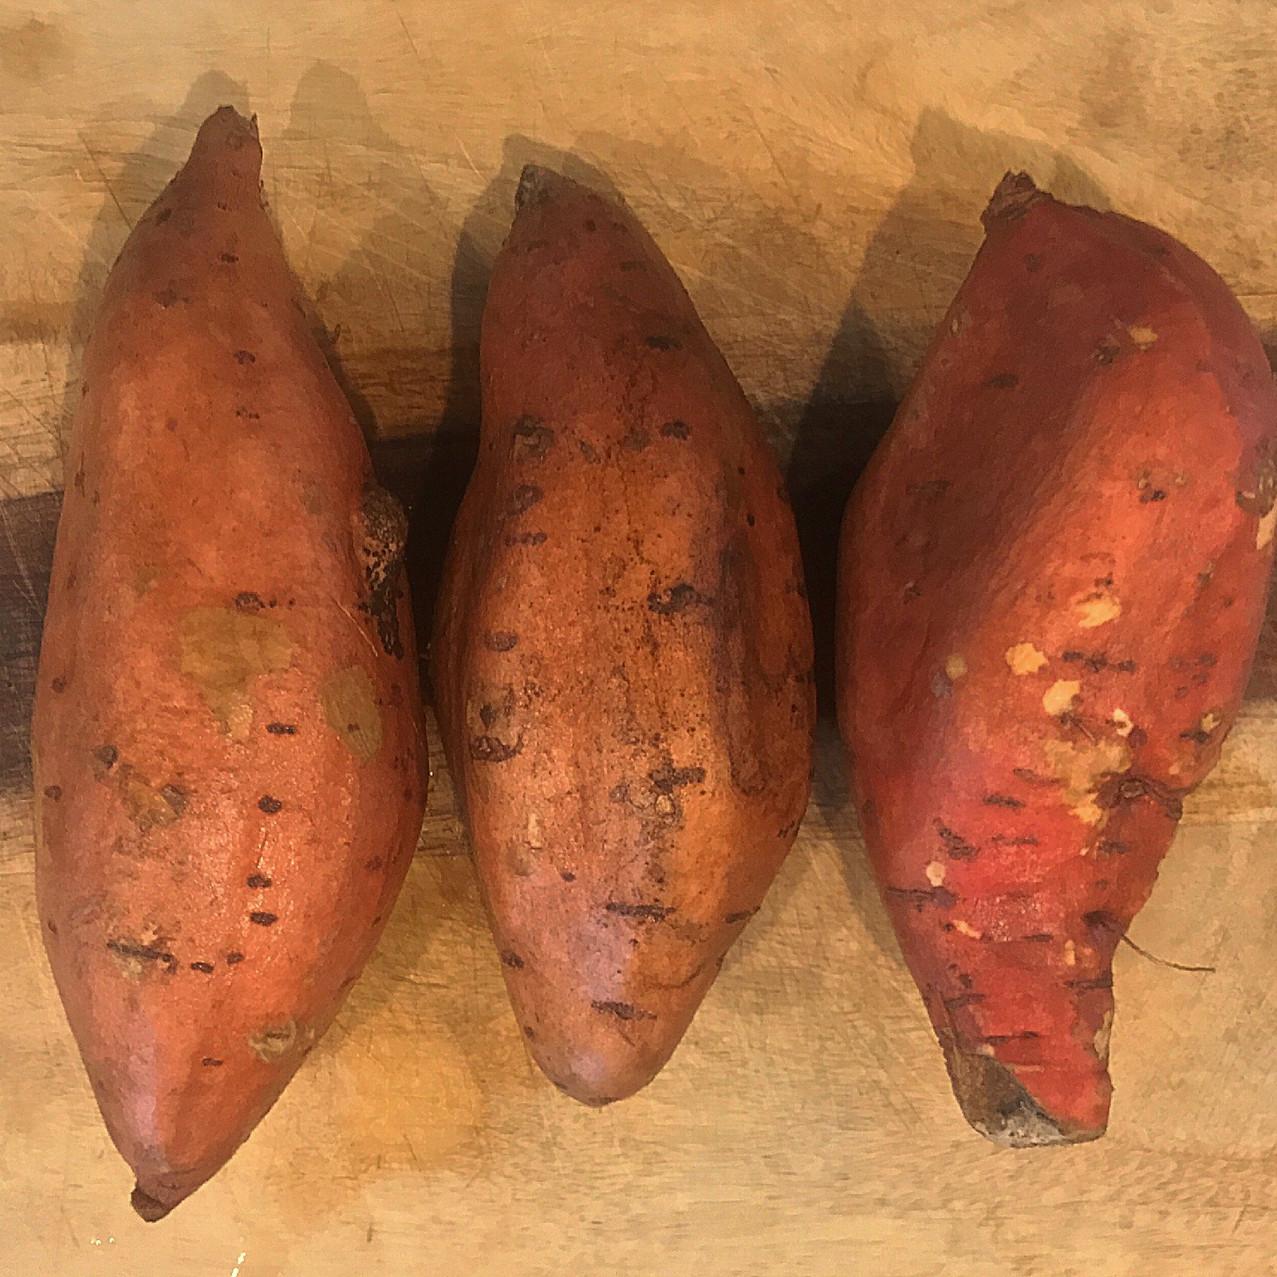 Large Sweet Potatoes